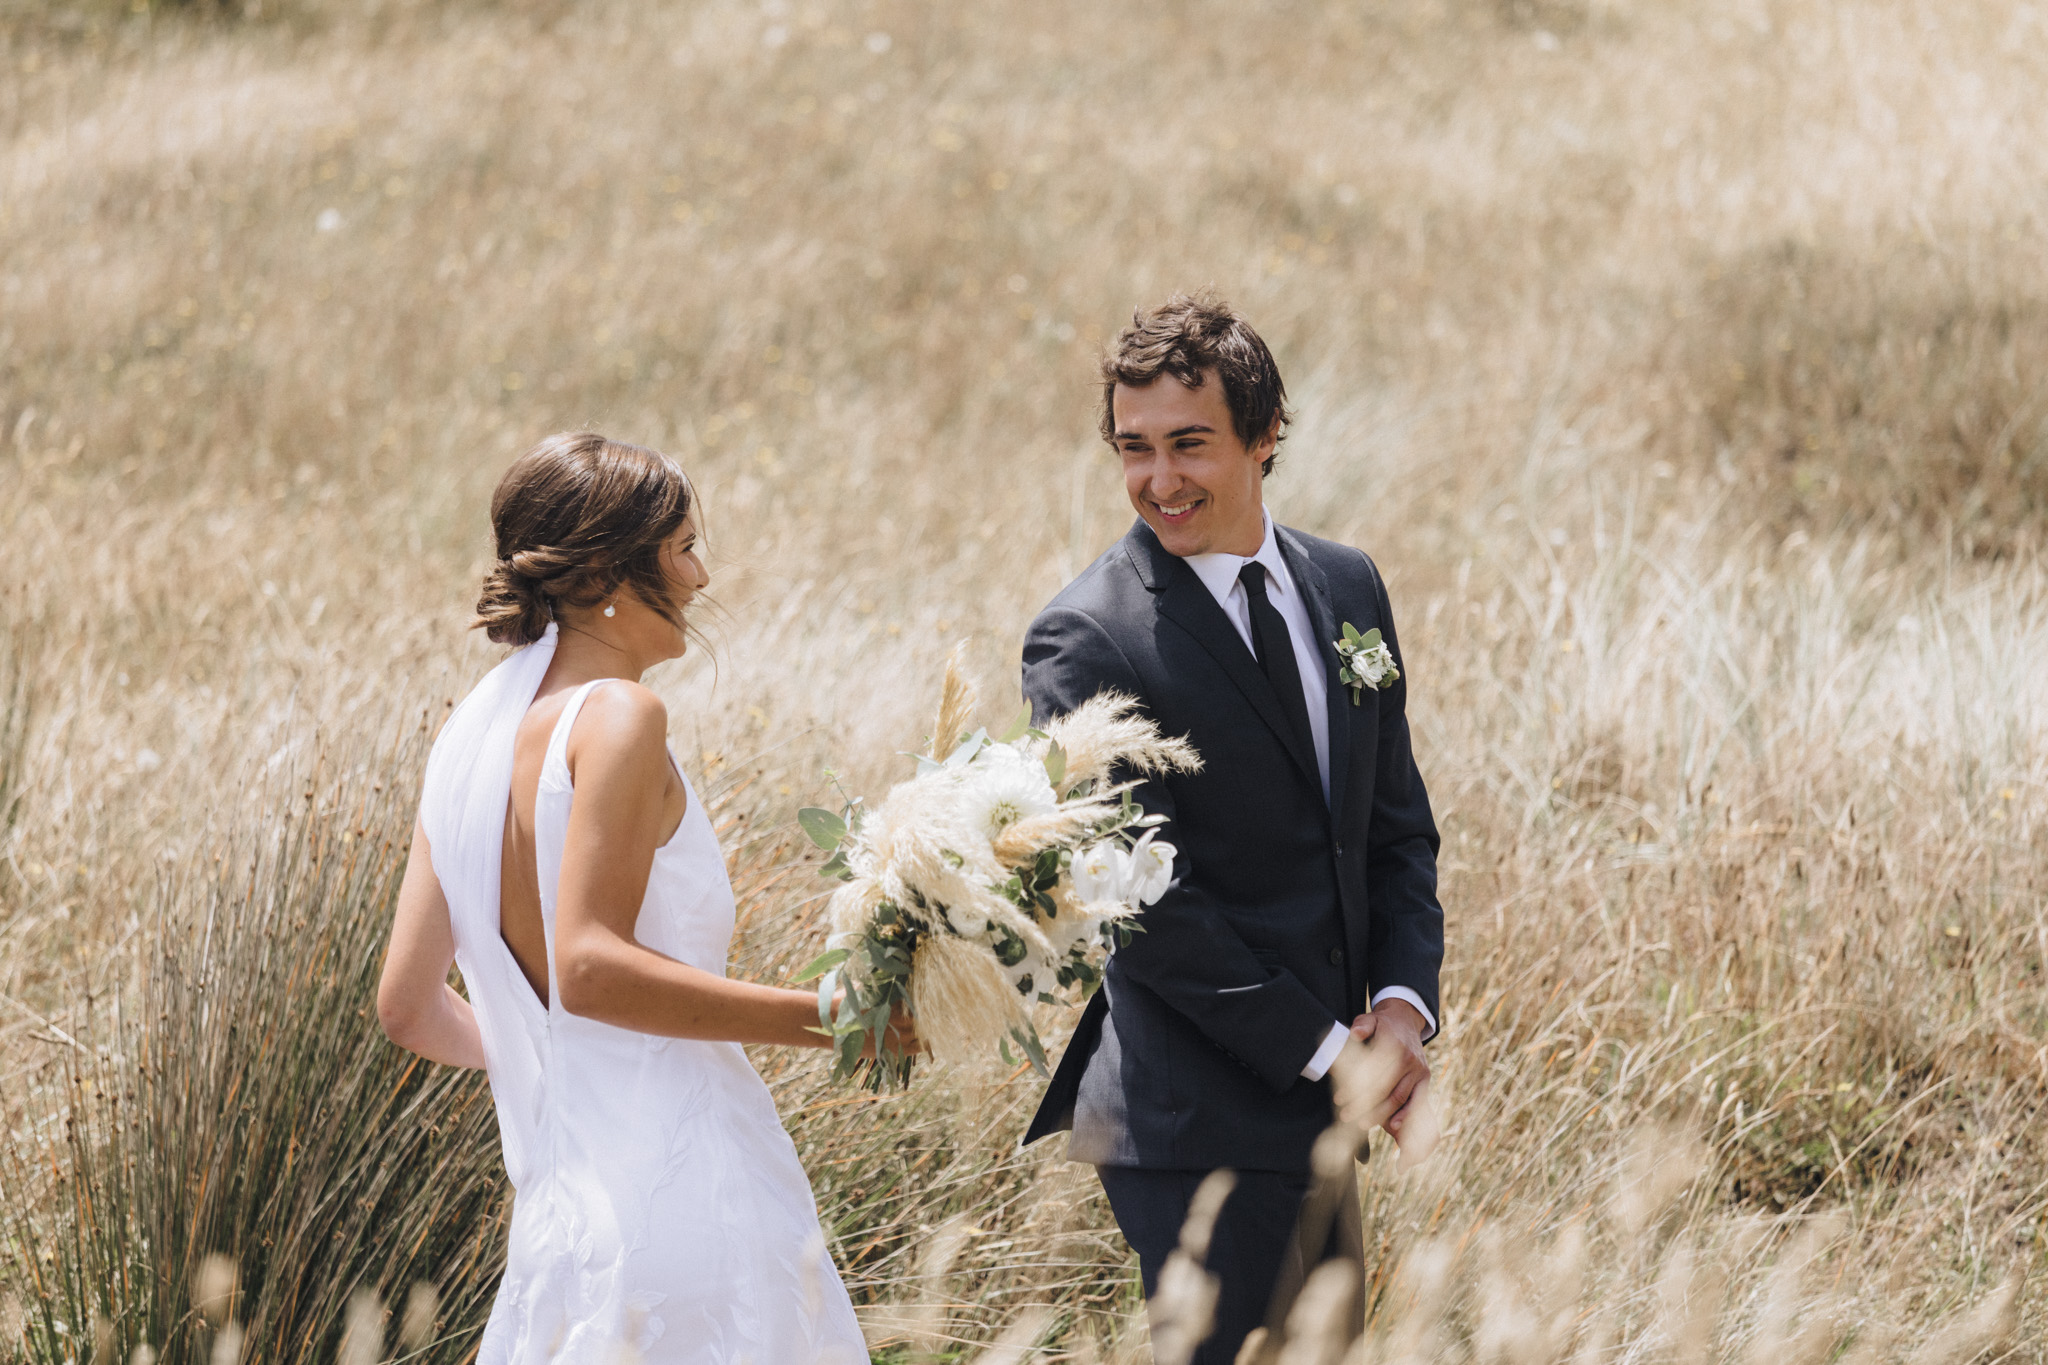 newfound-h-m-castaways-waiuku-auckland-wedding-photographer-25